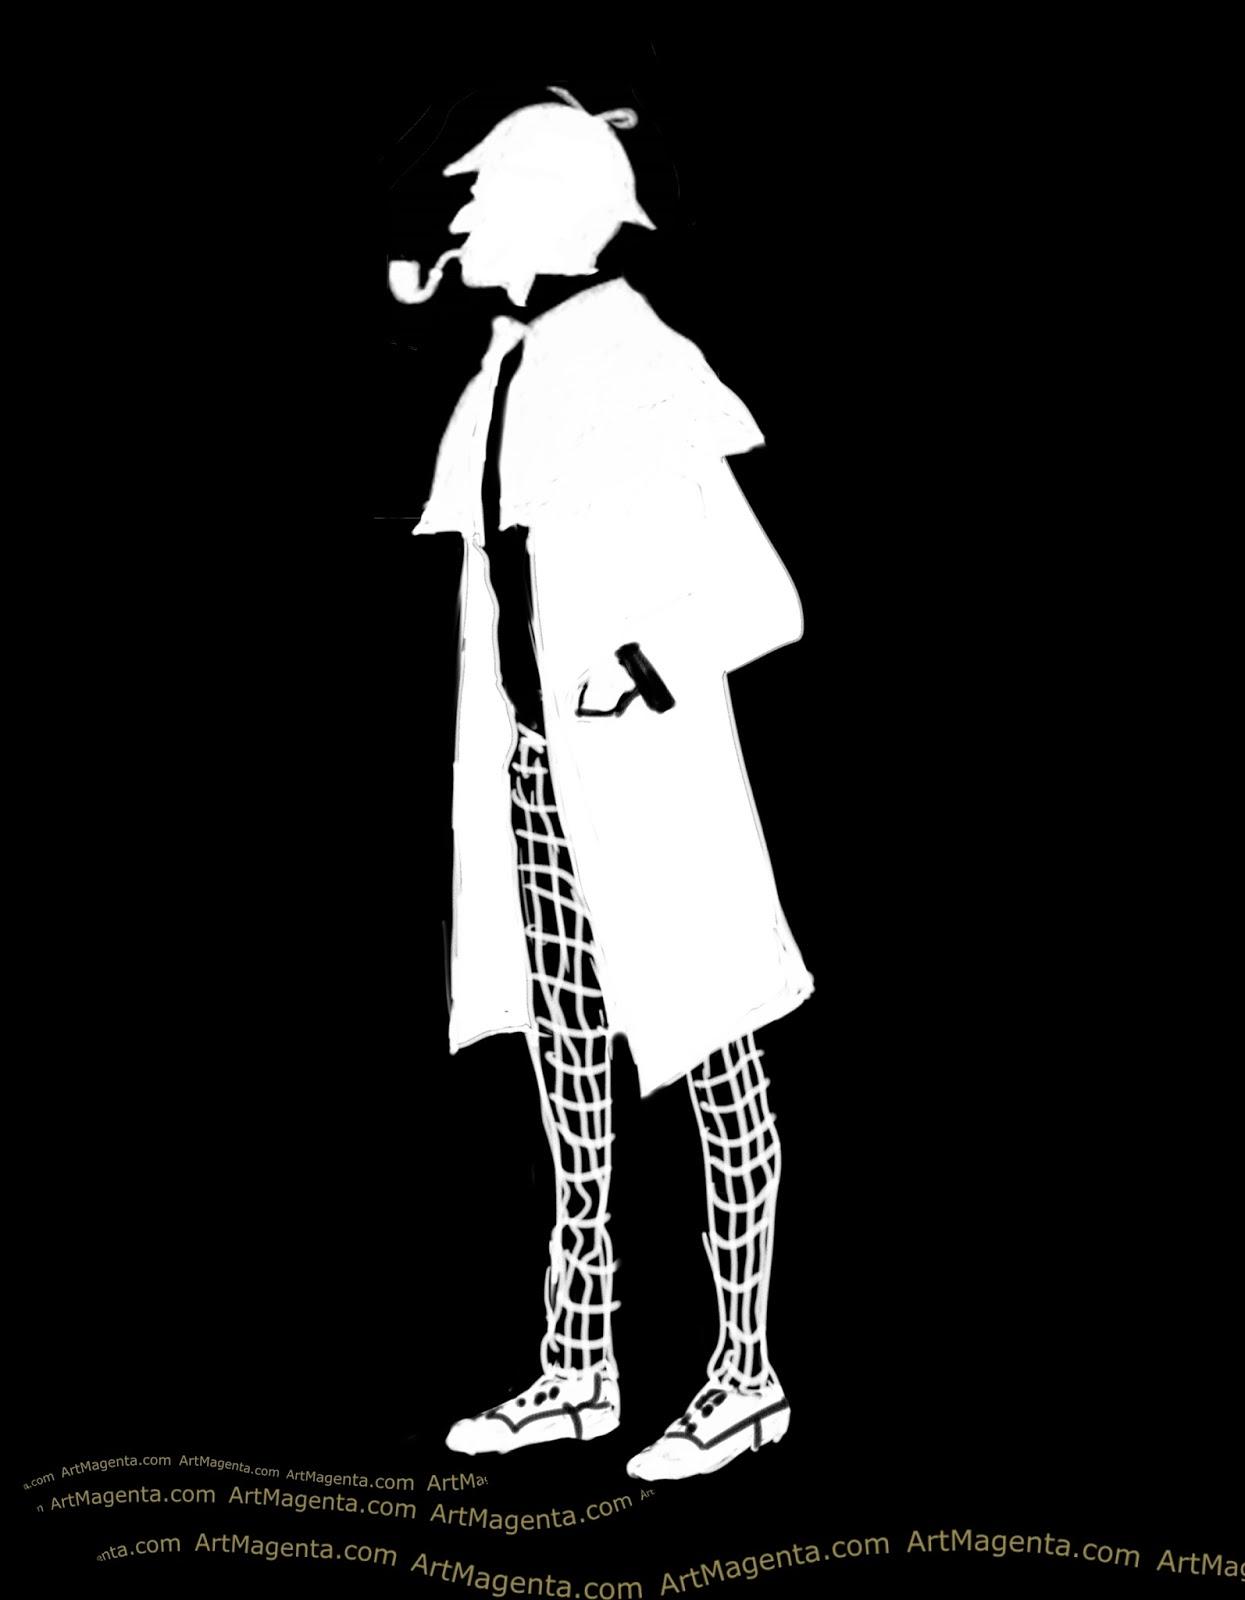 Sherlock Holmes caricature cartoon. Portrait drawing by caricaturist Artmagenta